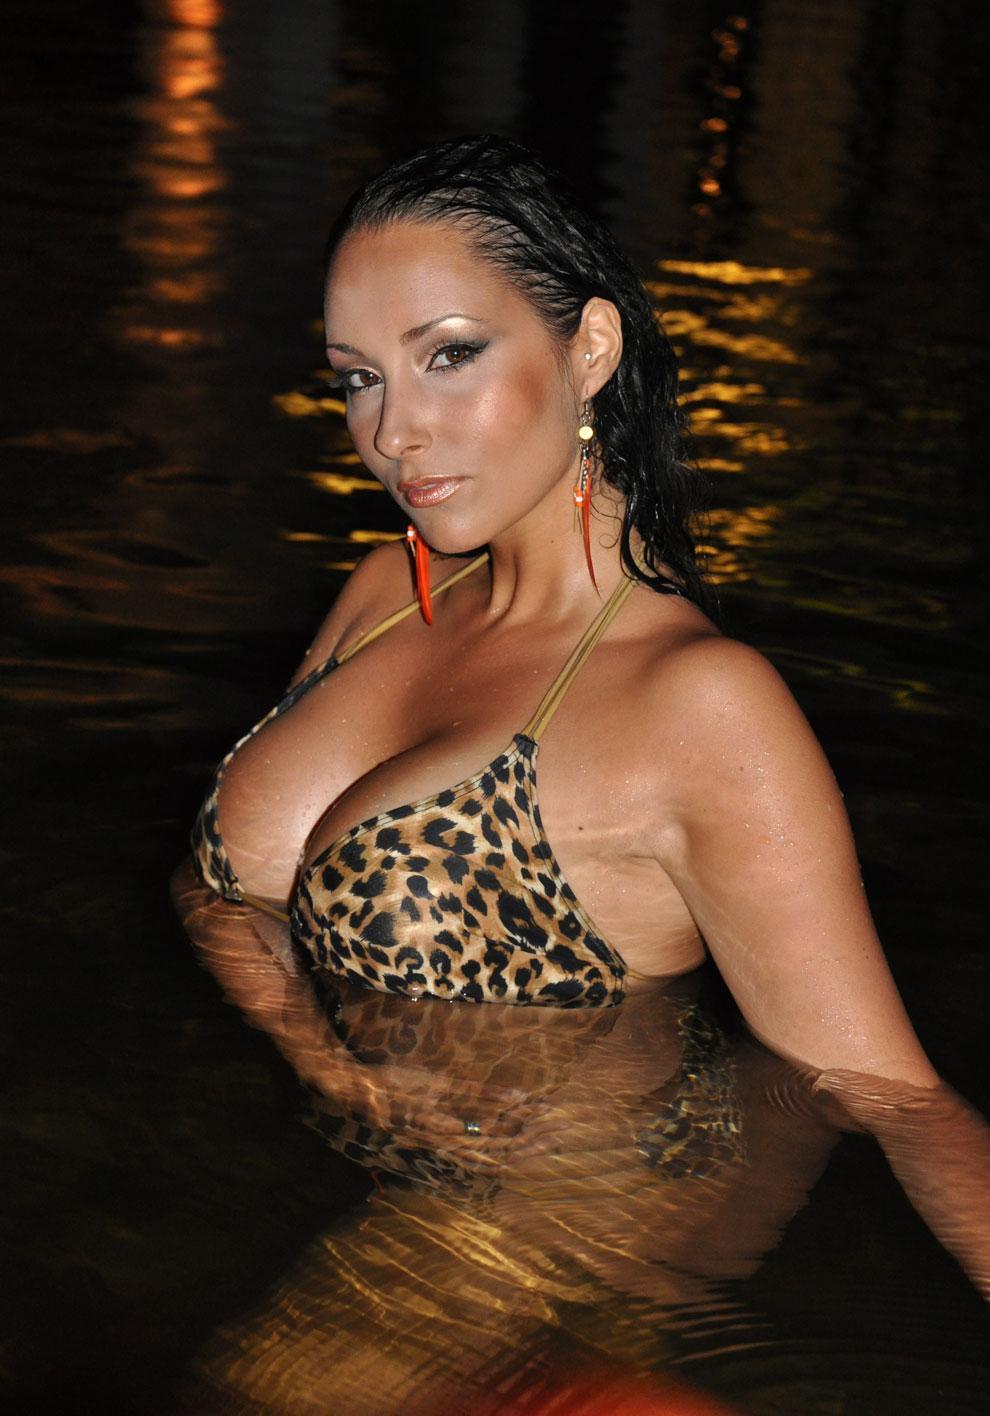 hot girl porn finnish porn torrent